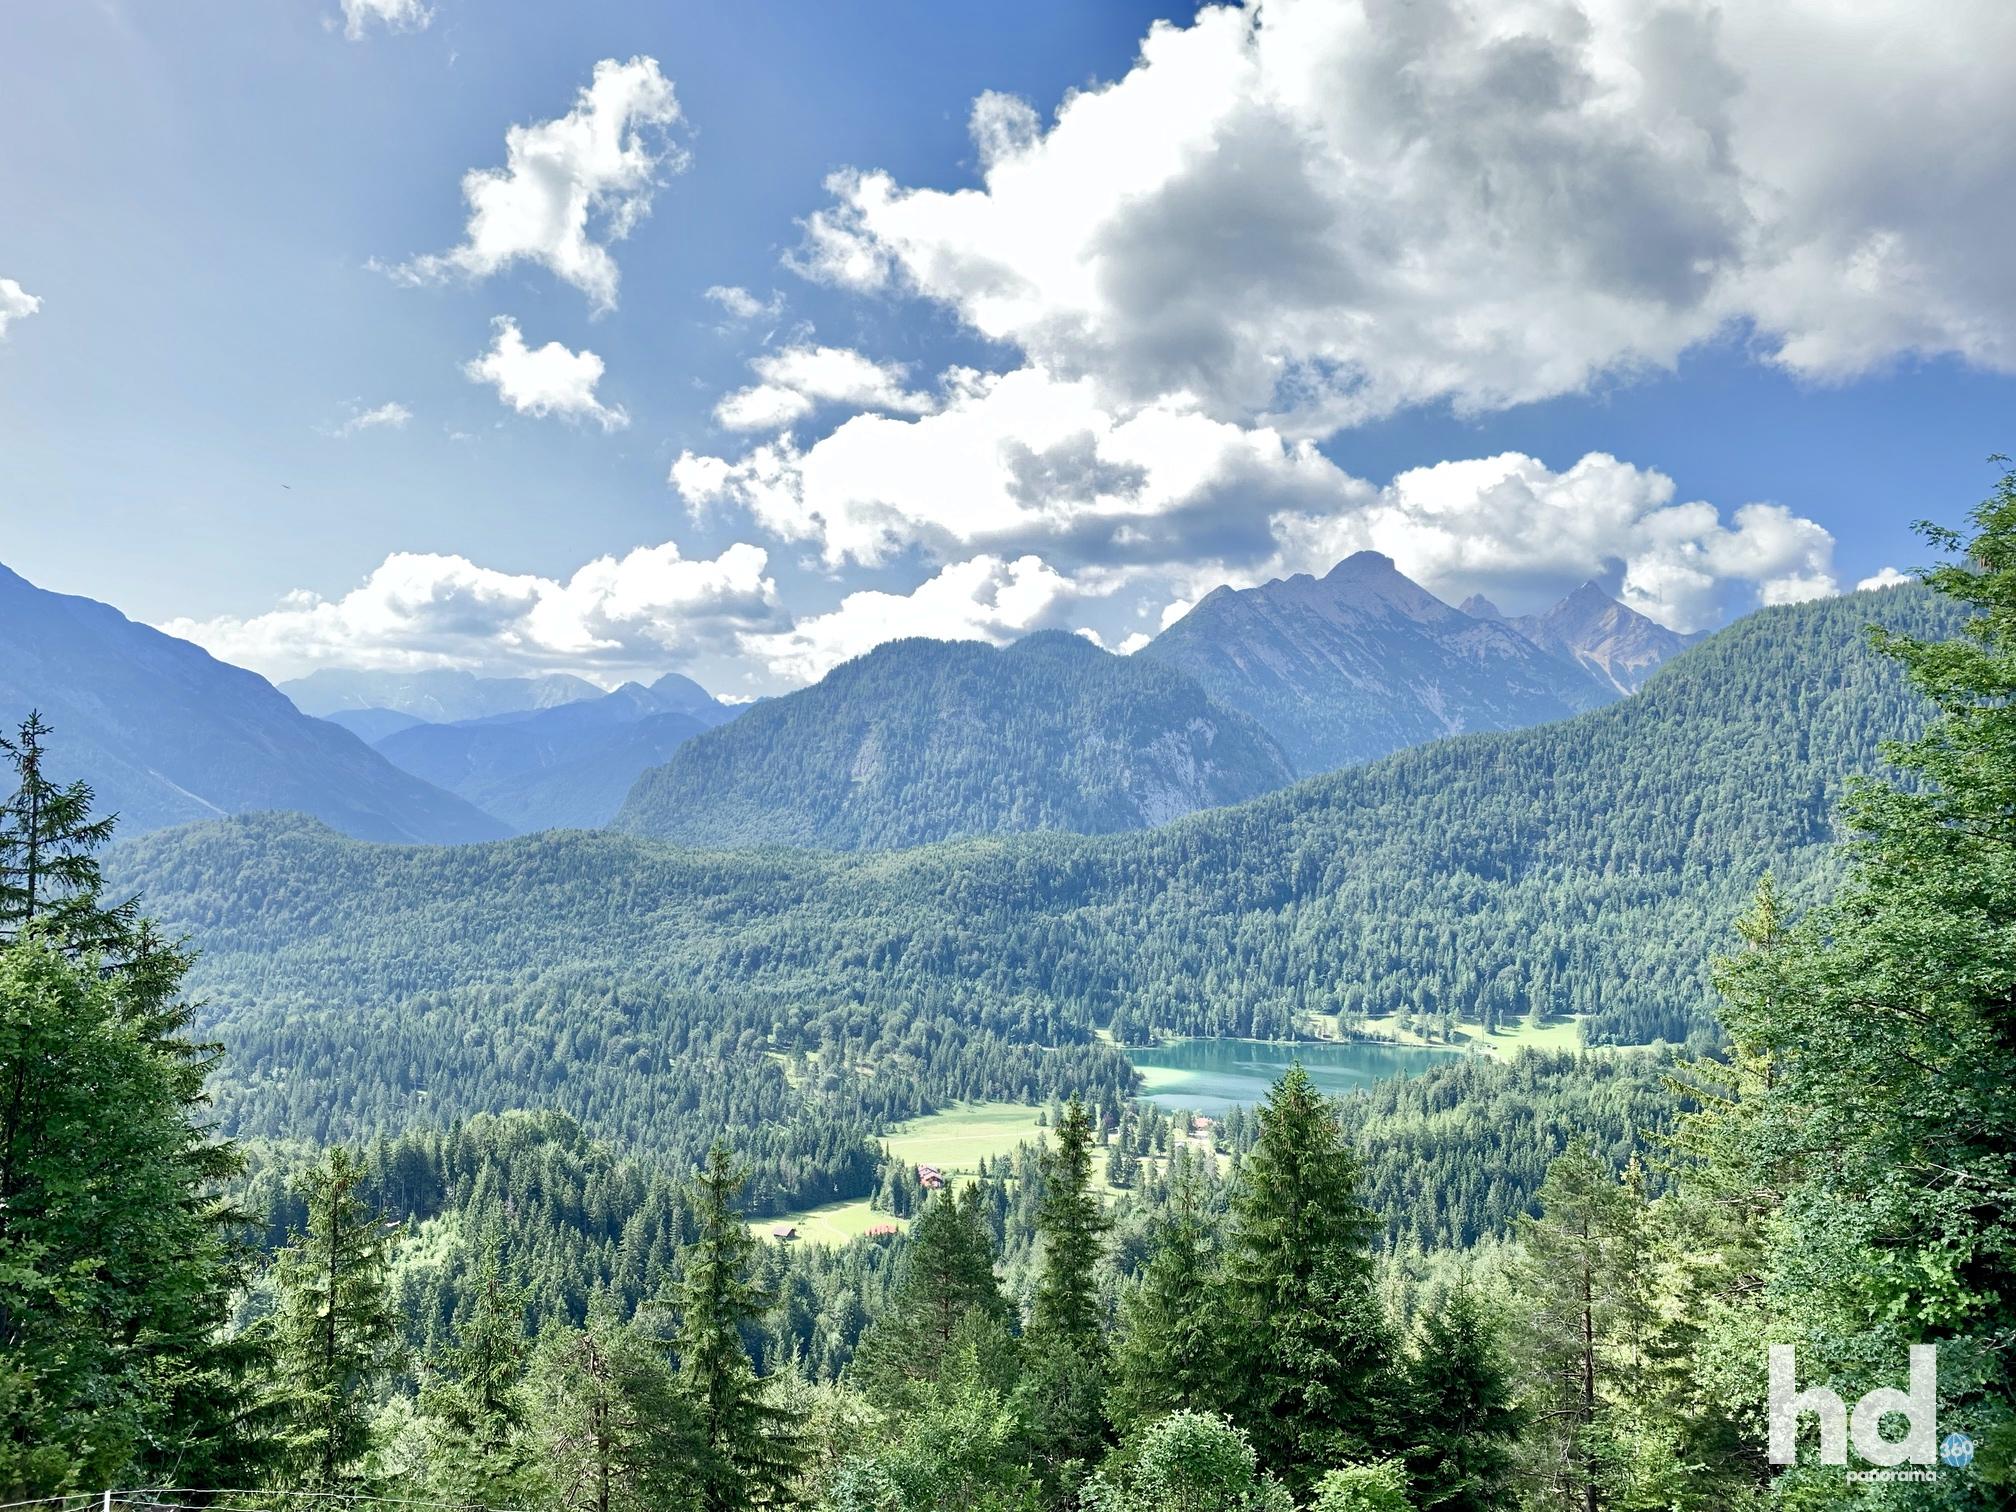 Barfußwanderweg Mittenwald auf dem Kranzberg, Foto © HD-Panorama